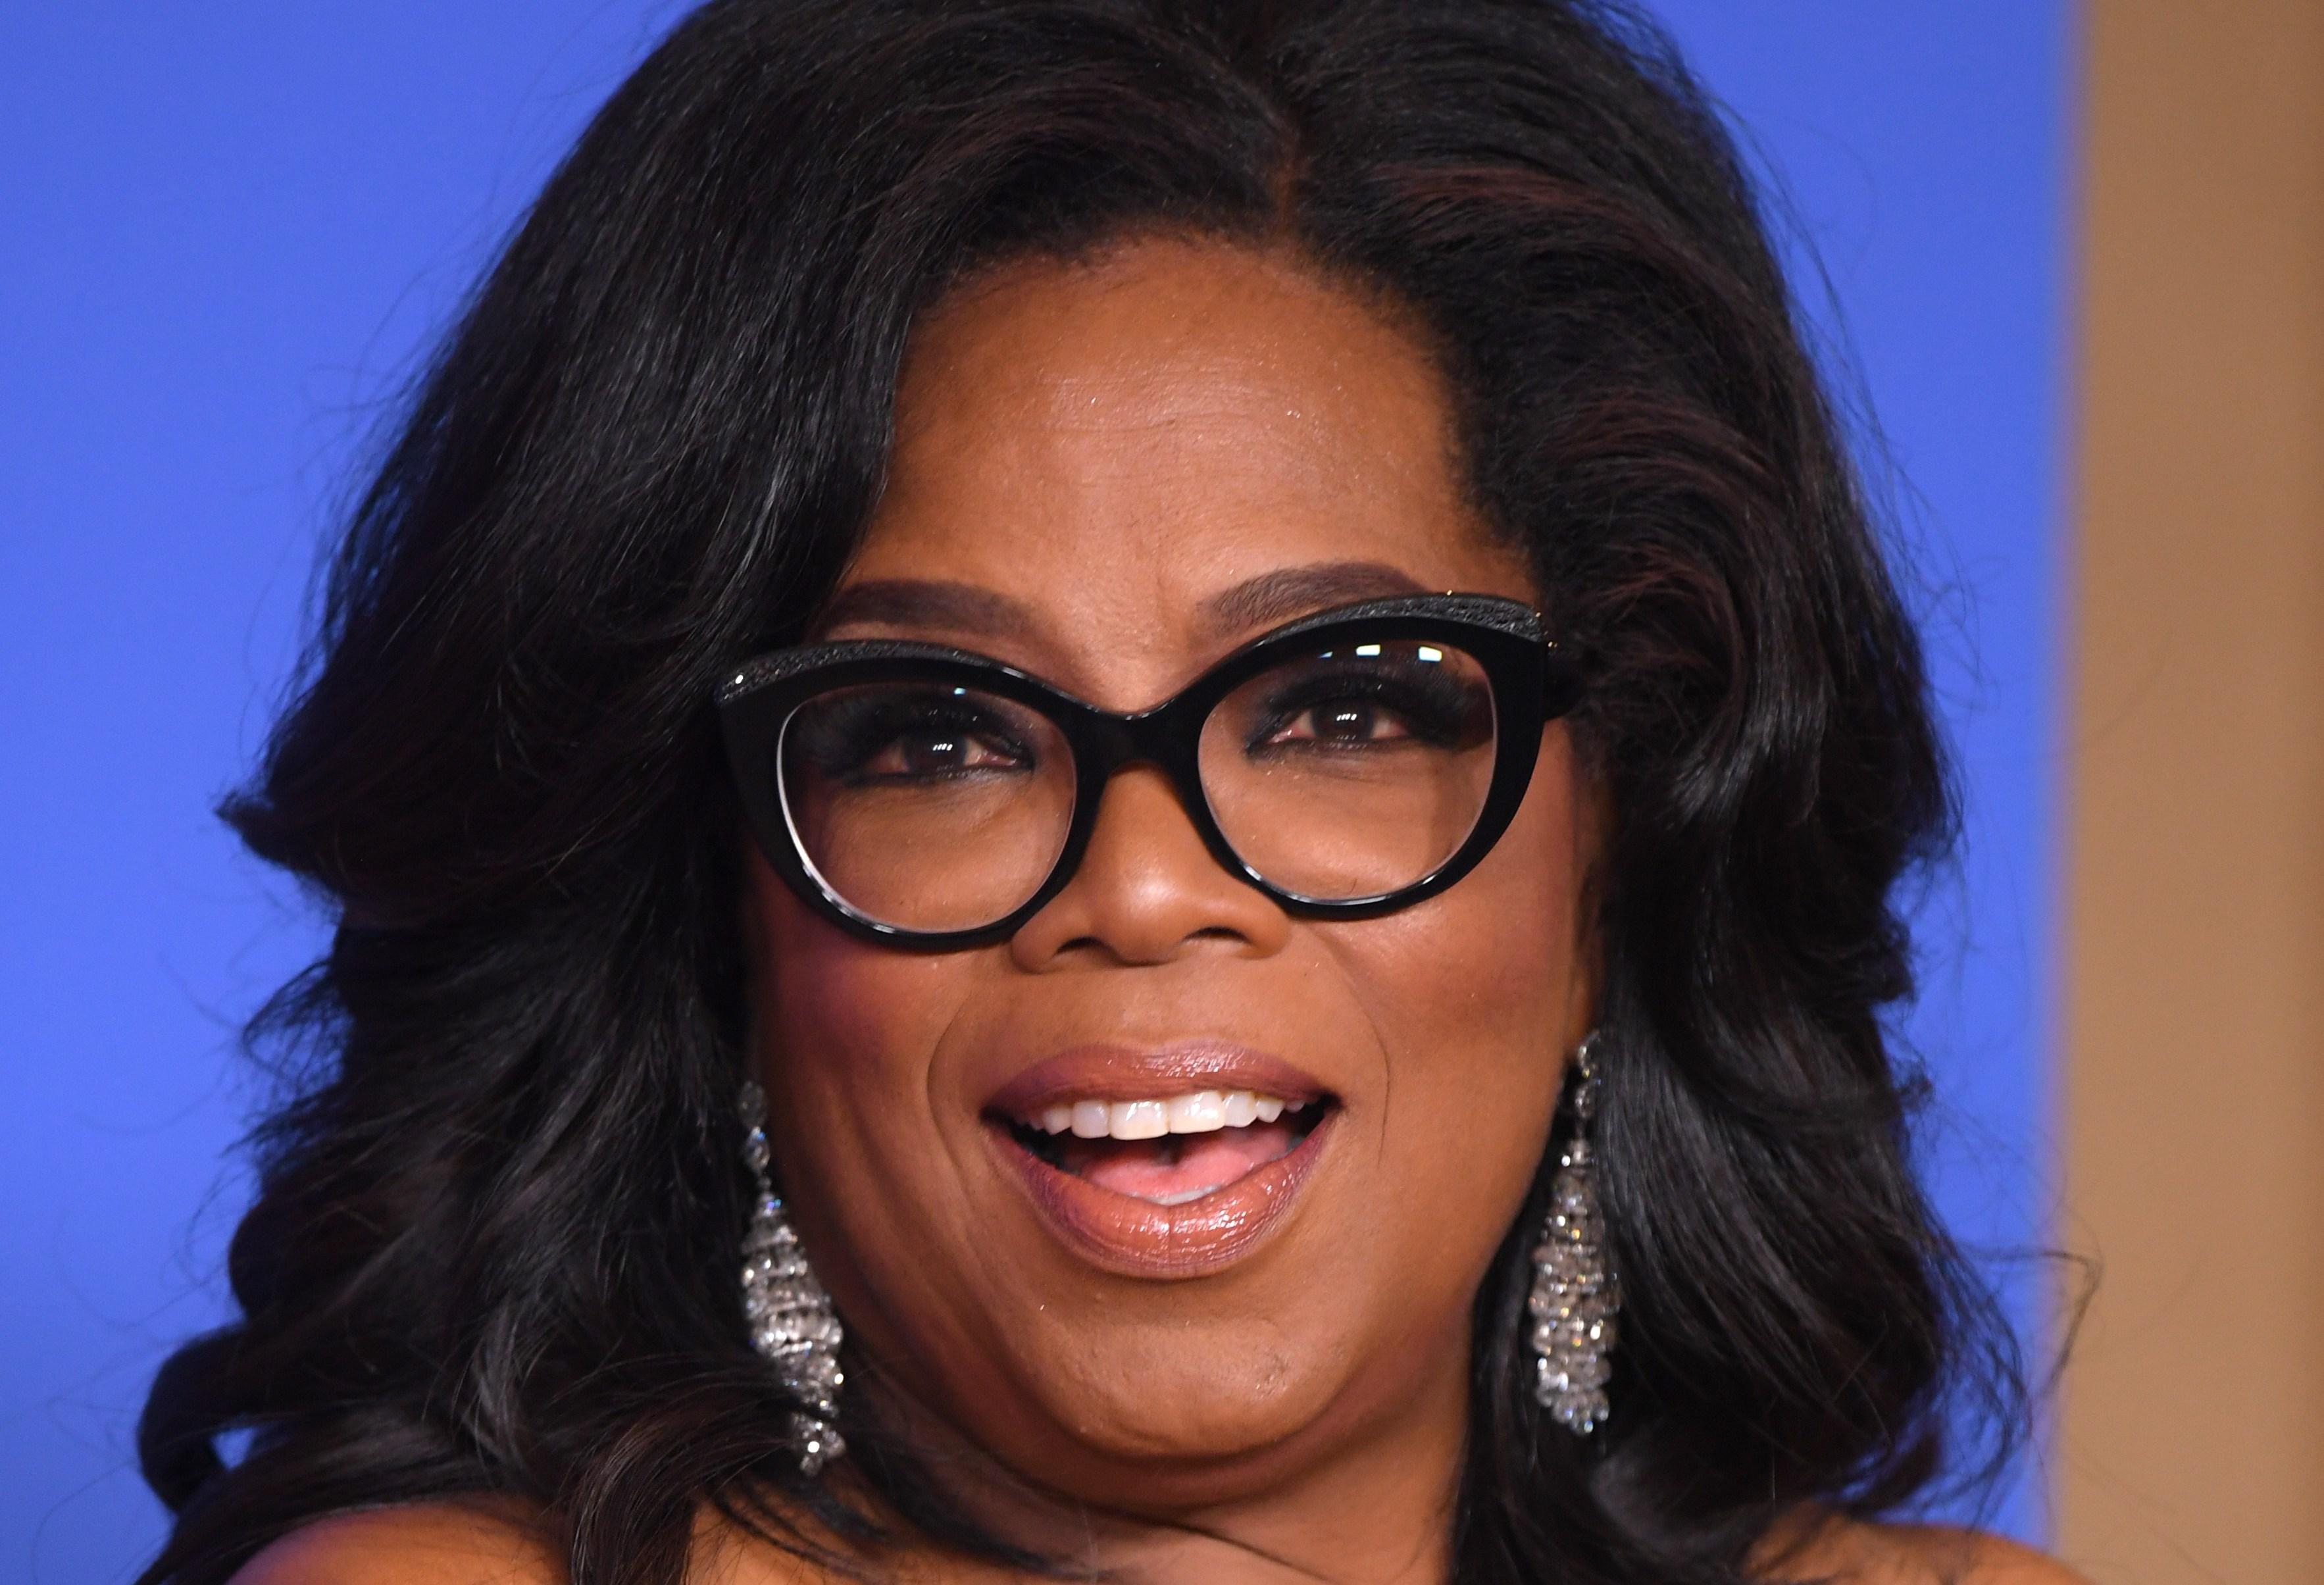 Oprah Winfrey - Cecil B. DeMille Award75th Annual Golden Globe Awards, Press Room, Los Angeles, USA - 07 Jan 2018